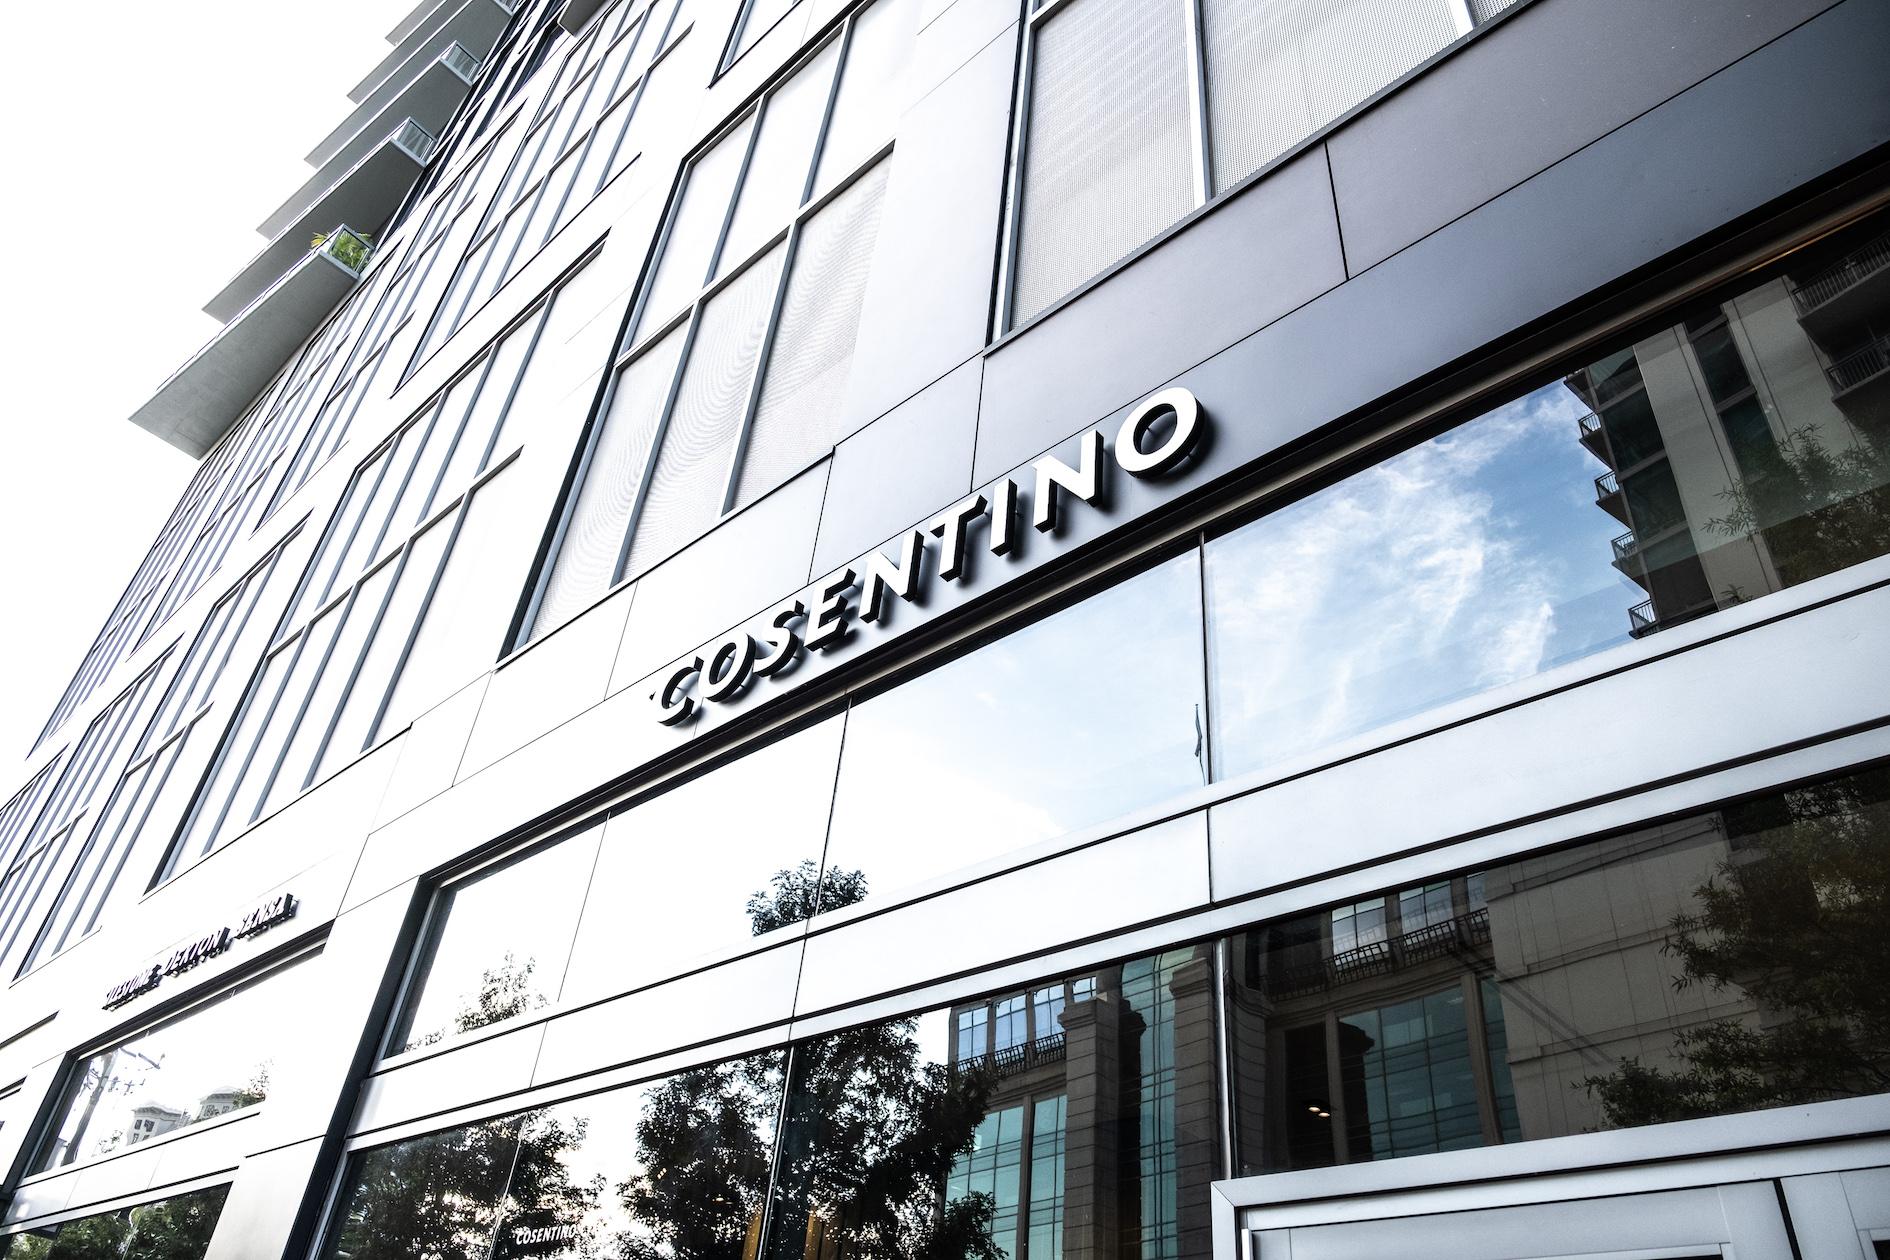 Image of Cosentino City Atlanta Facade in Cosentino opens new Atlanta City - Cosentino